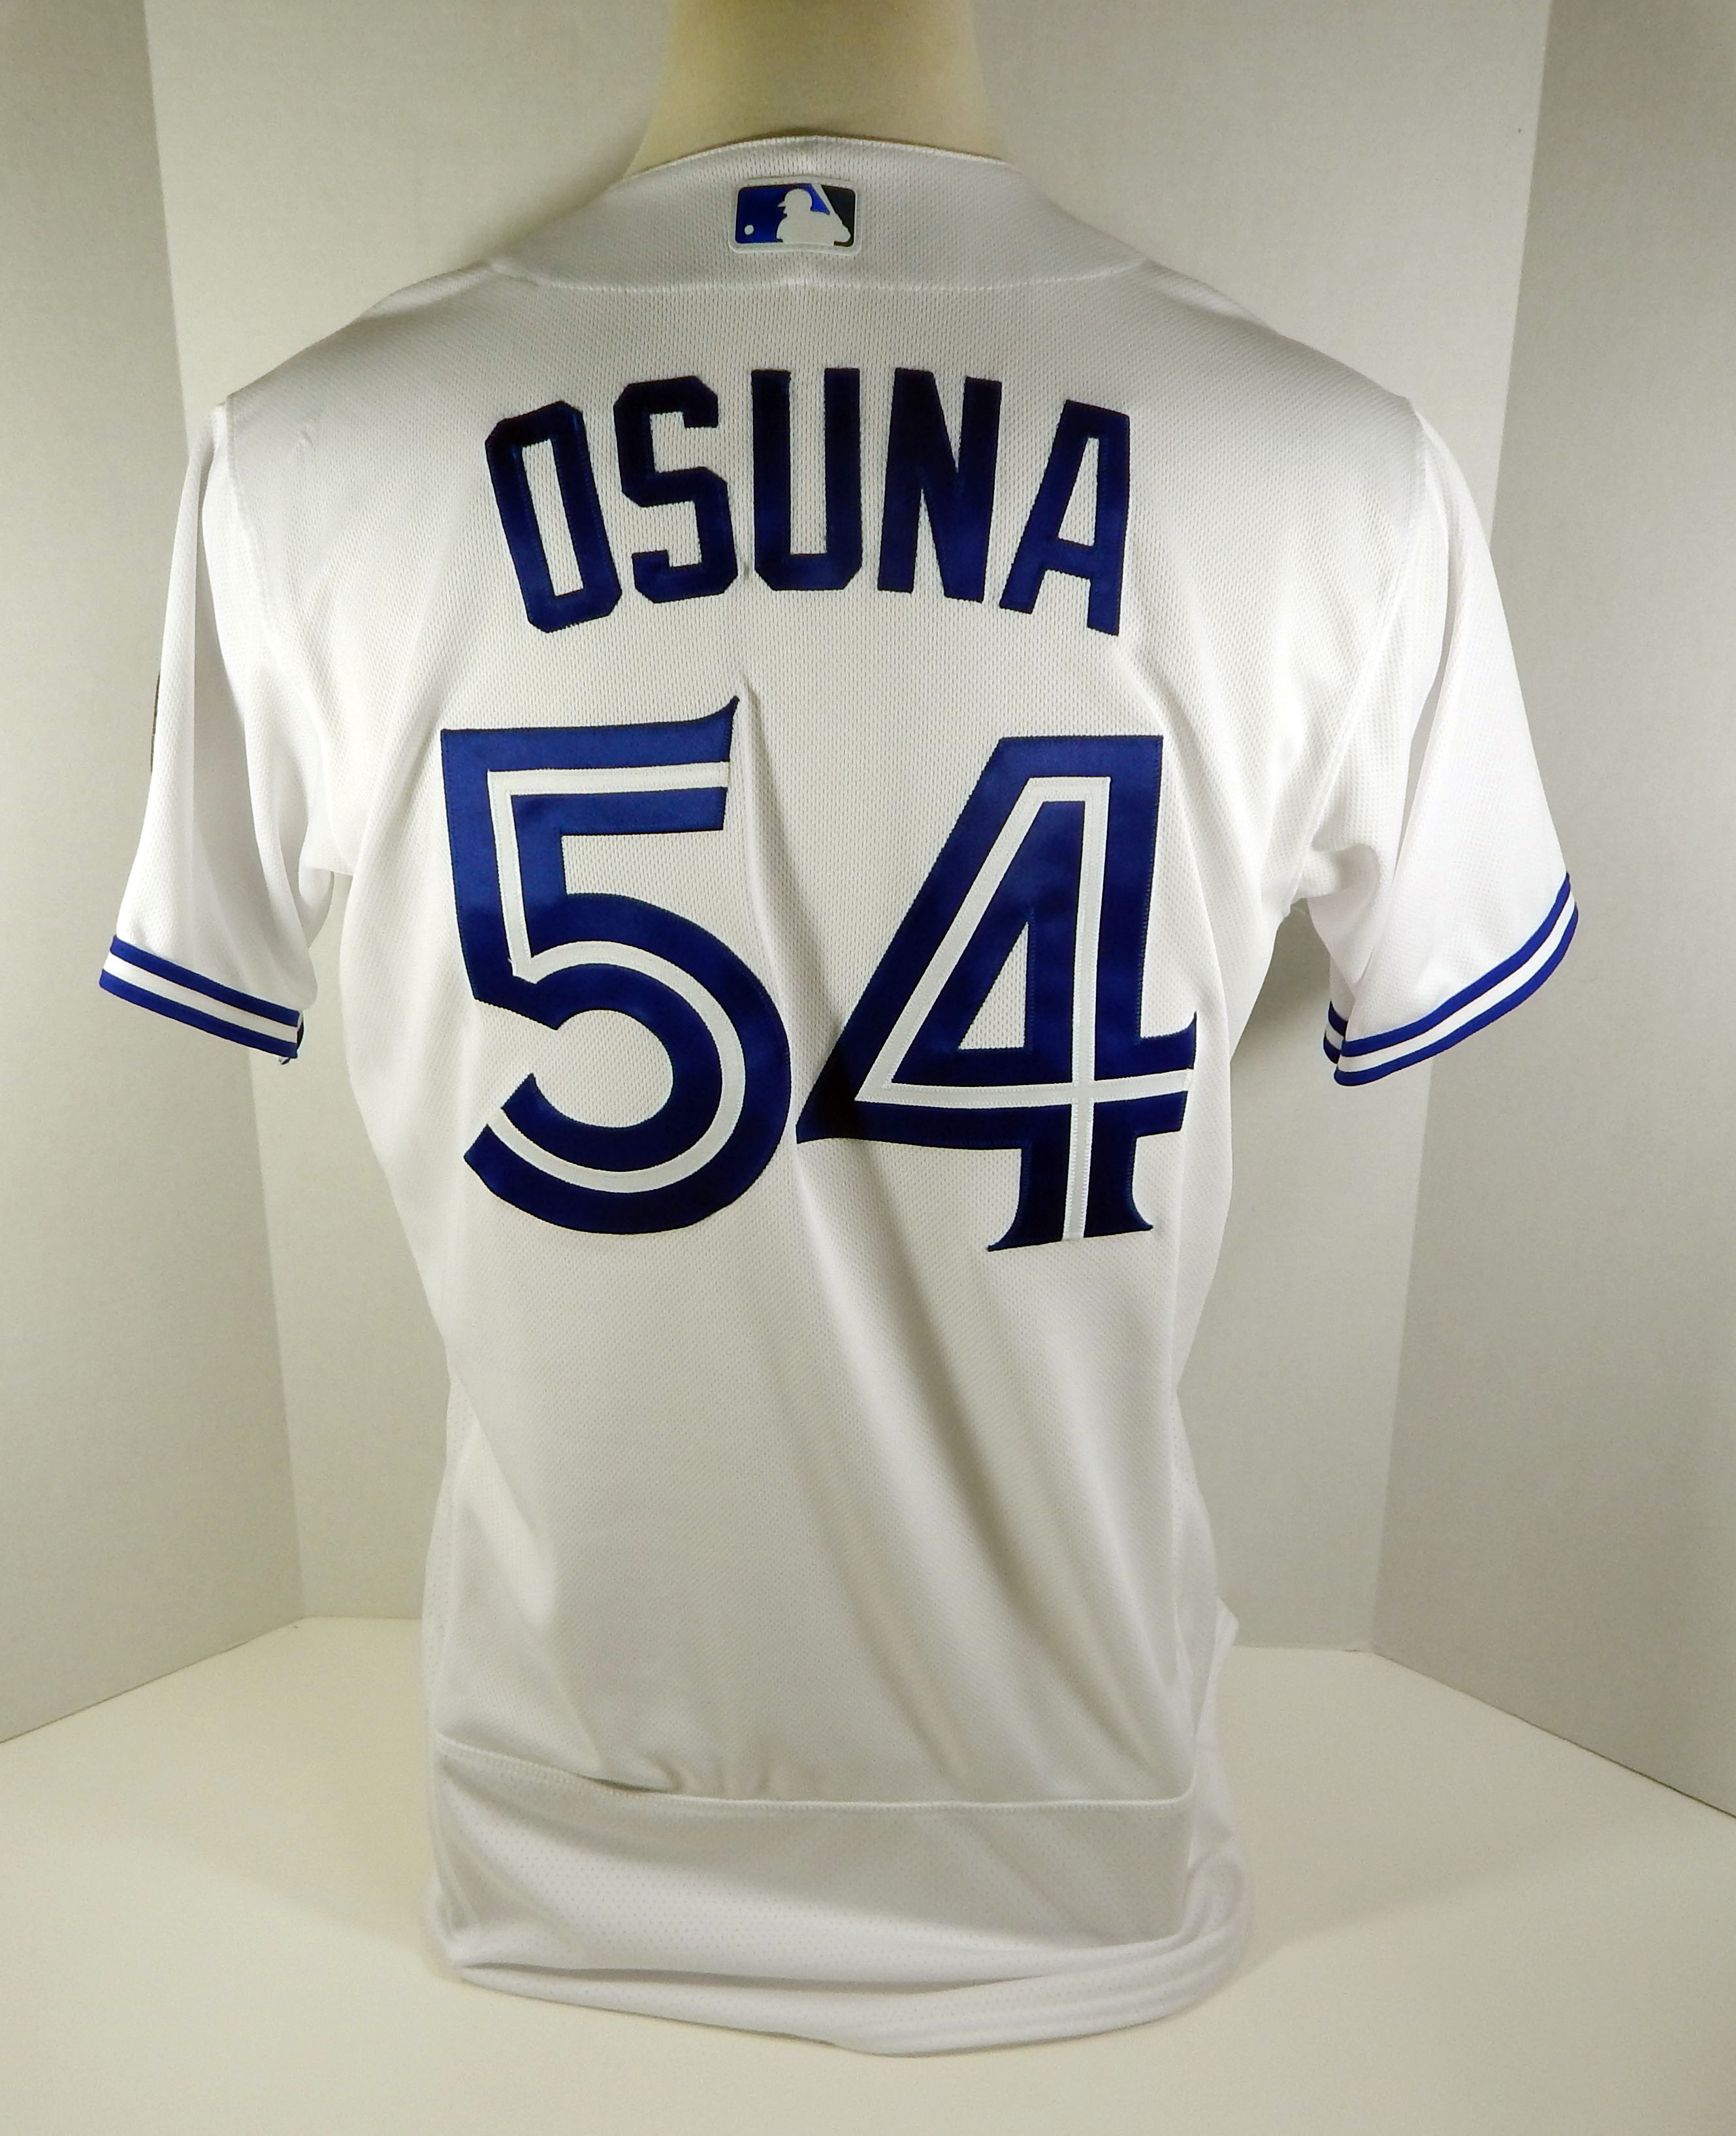 544c580b 2018 Toronto Blue Jays Roberto Osuna #54 Game Issued White Jersey 32 ...